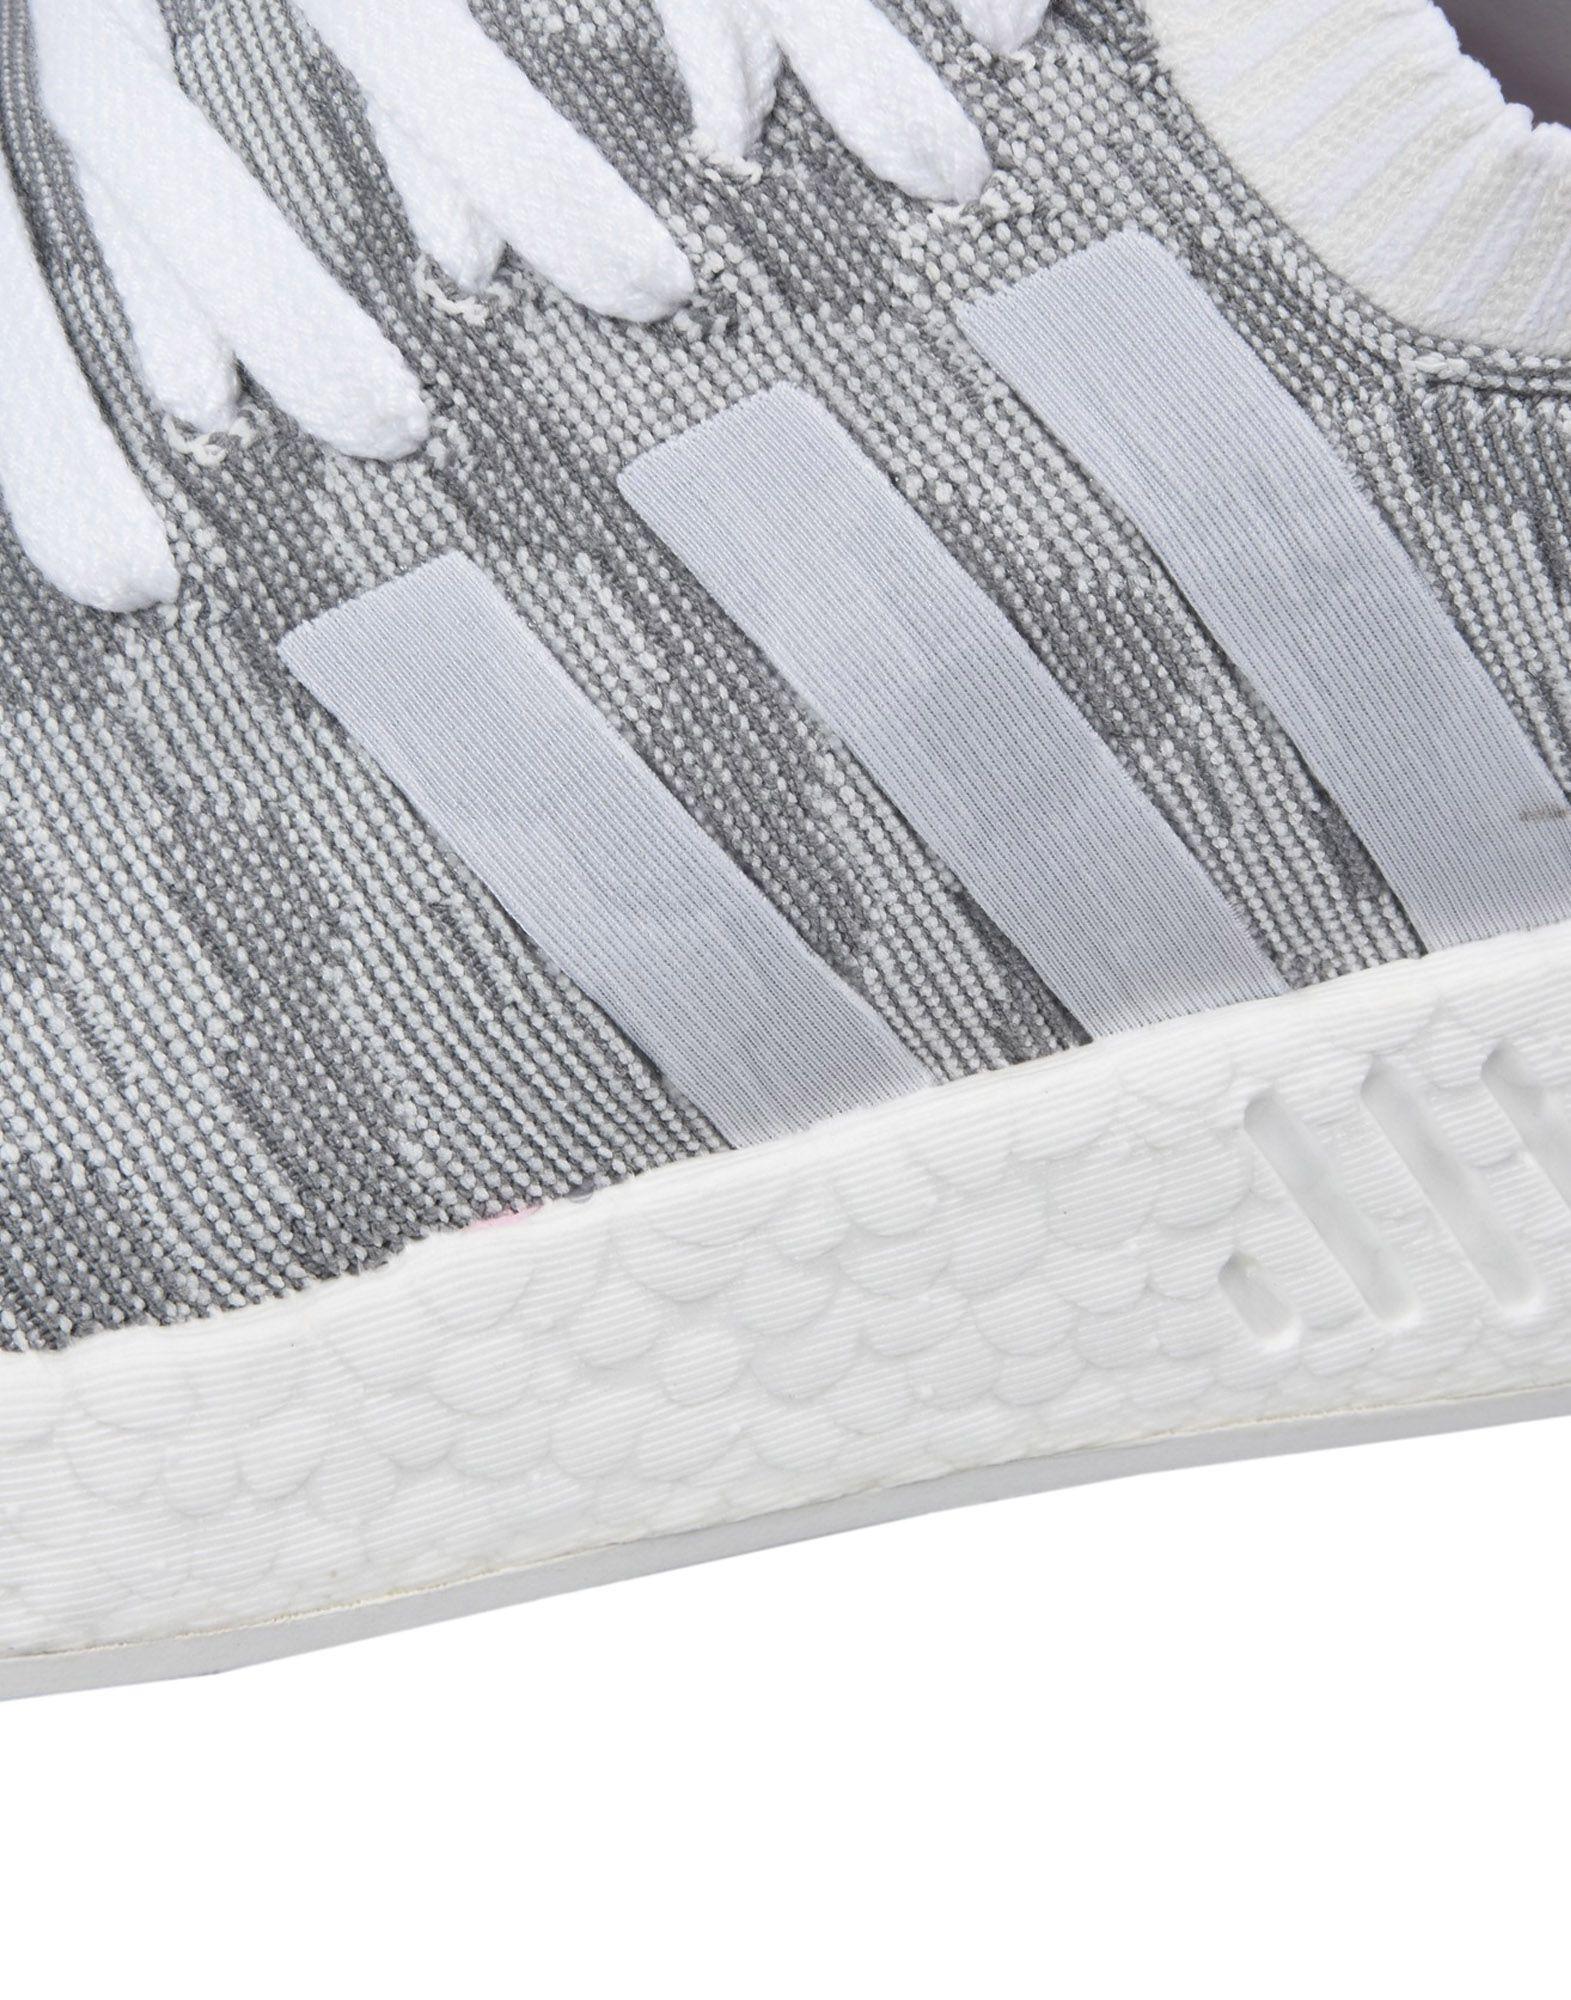 Gut um billige Schuhe Pk zu tragenAdidas Originals Nmd_R2 Pk Schuhe W  11316334BW 735bc1